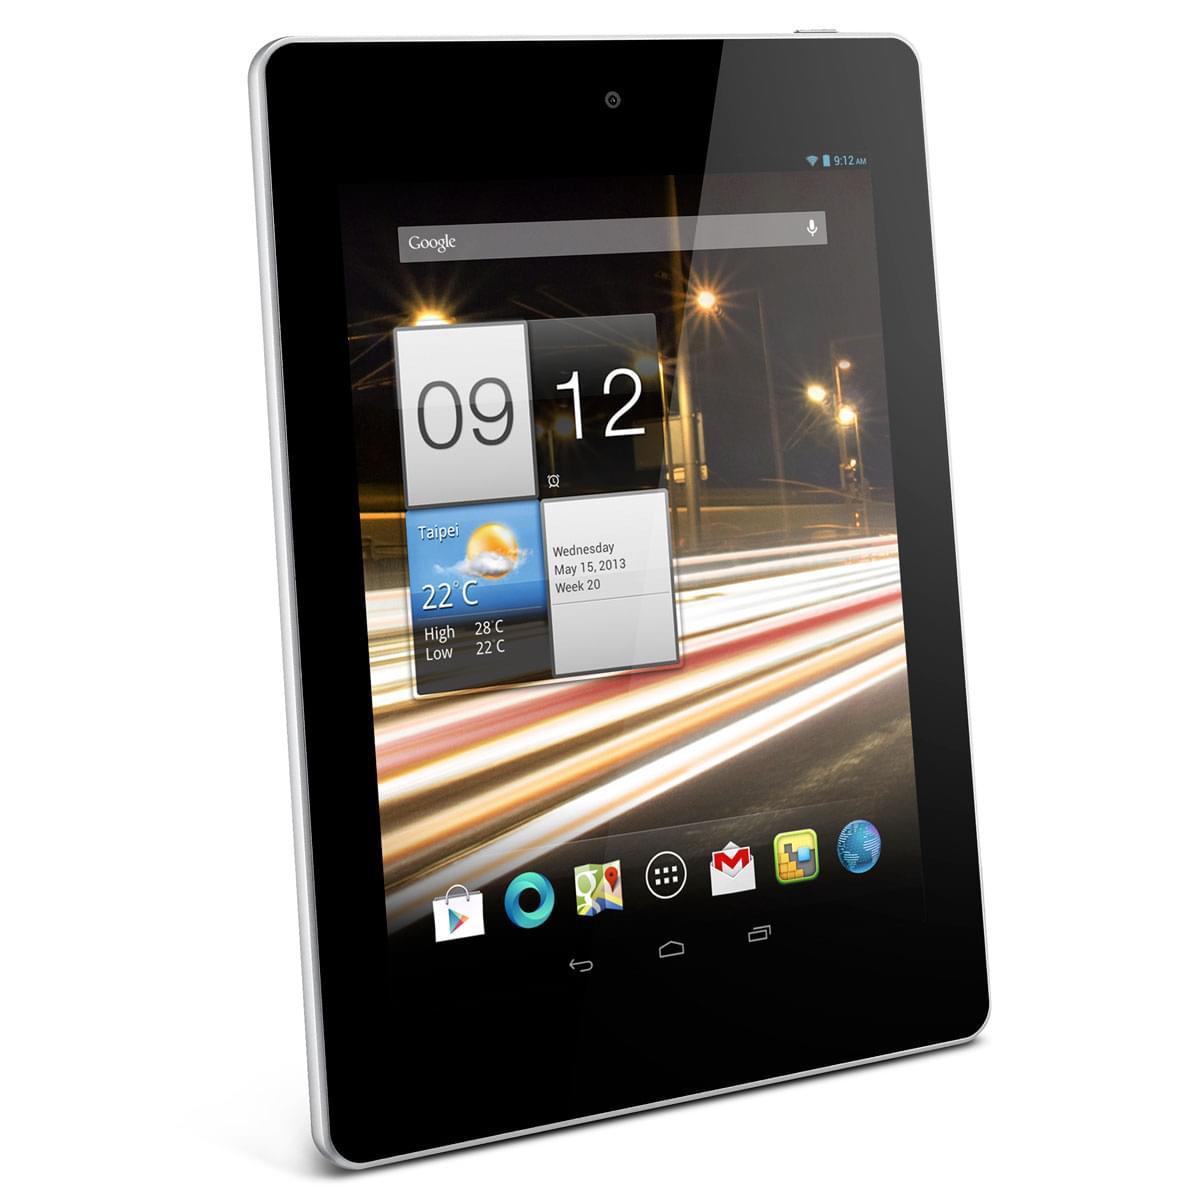 Acer Iconia Tab A1-810 - Tablette tactile Acer - Cybertek.fr - 0